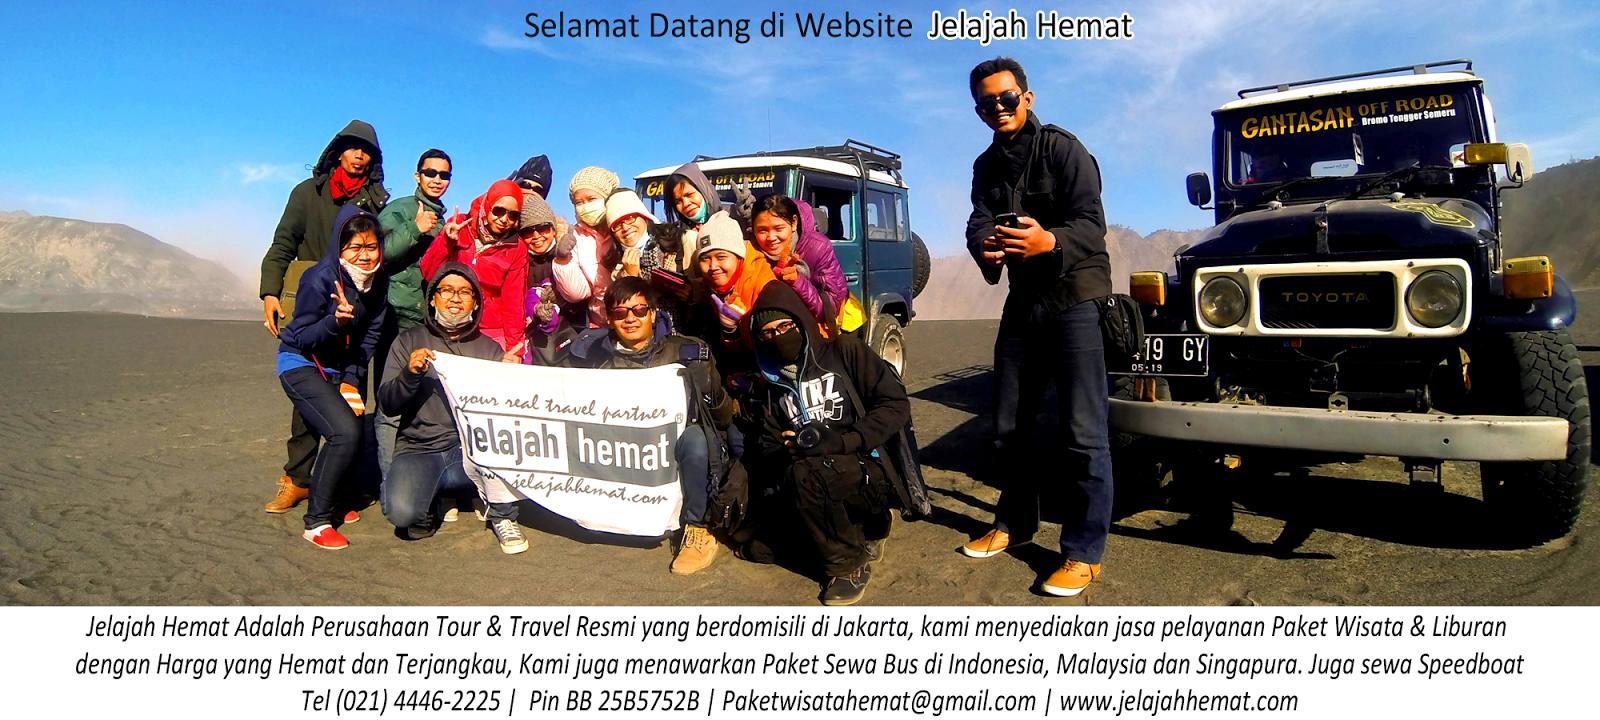 Paket Wisata Hemat | JelajahHemat.com